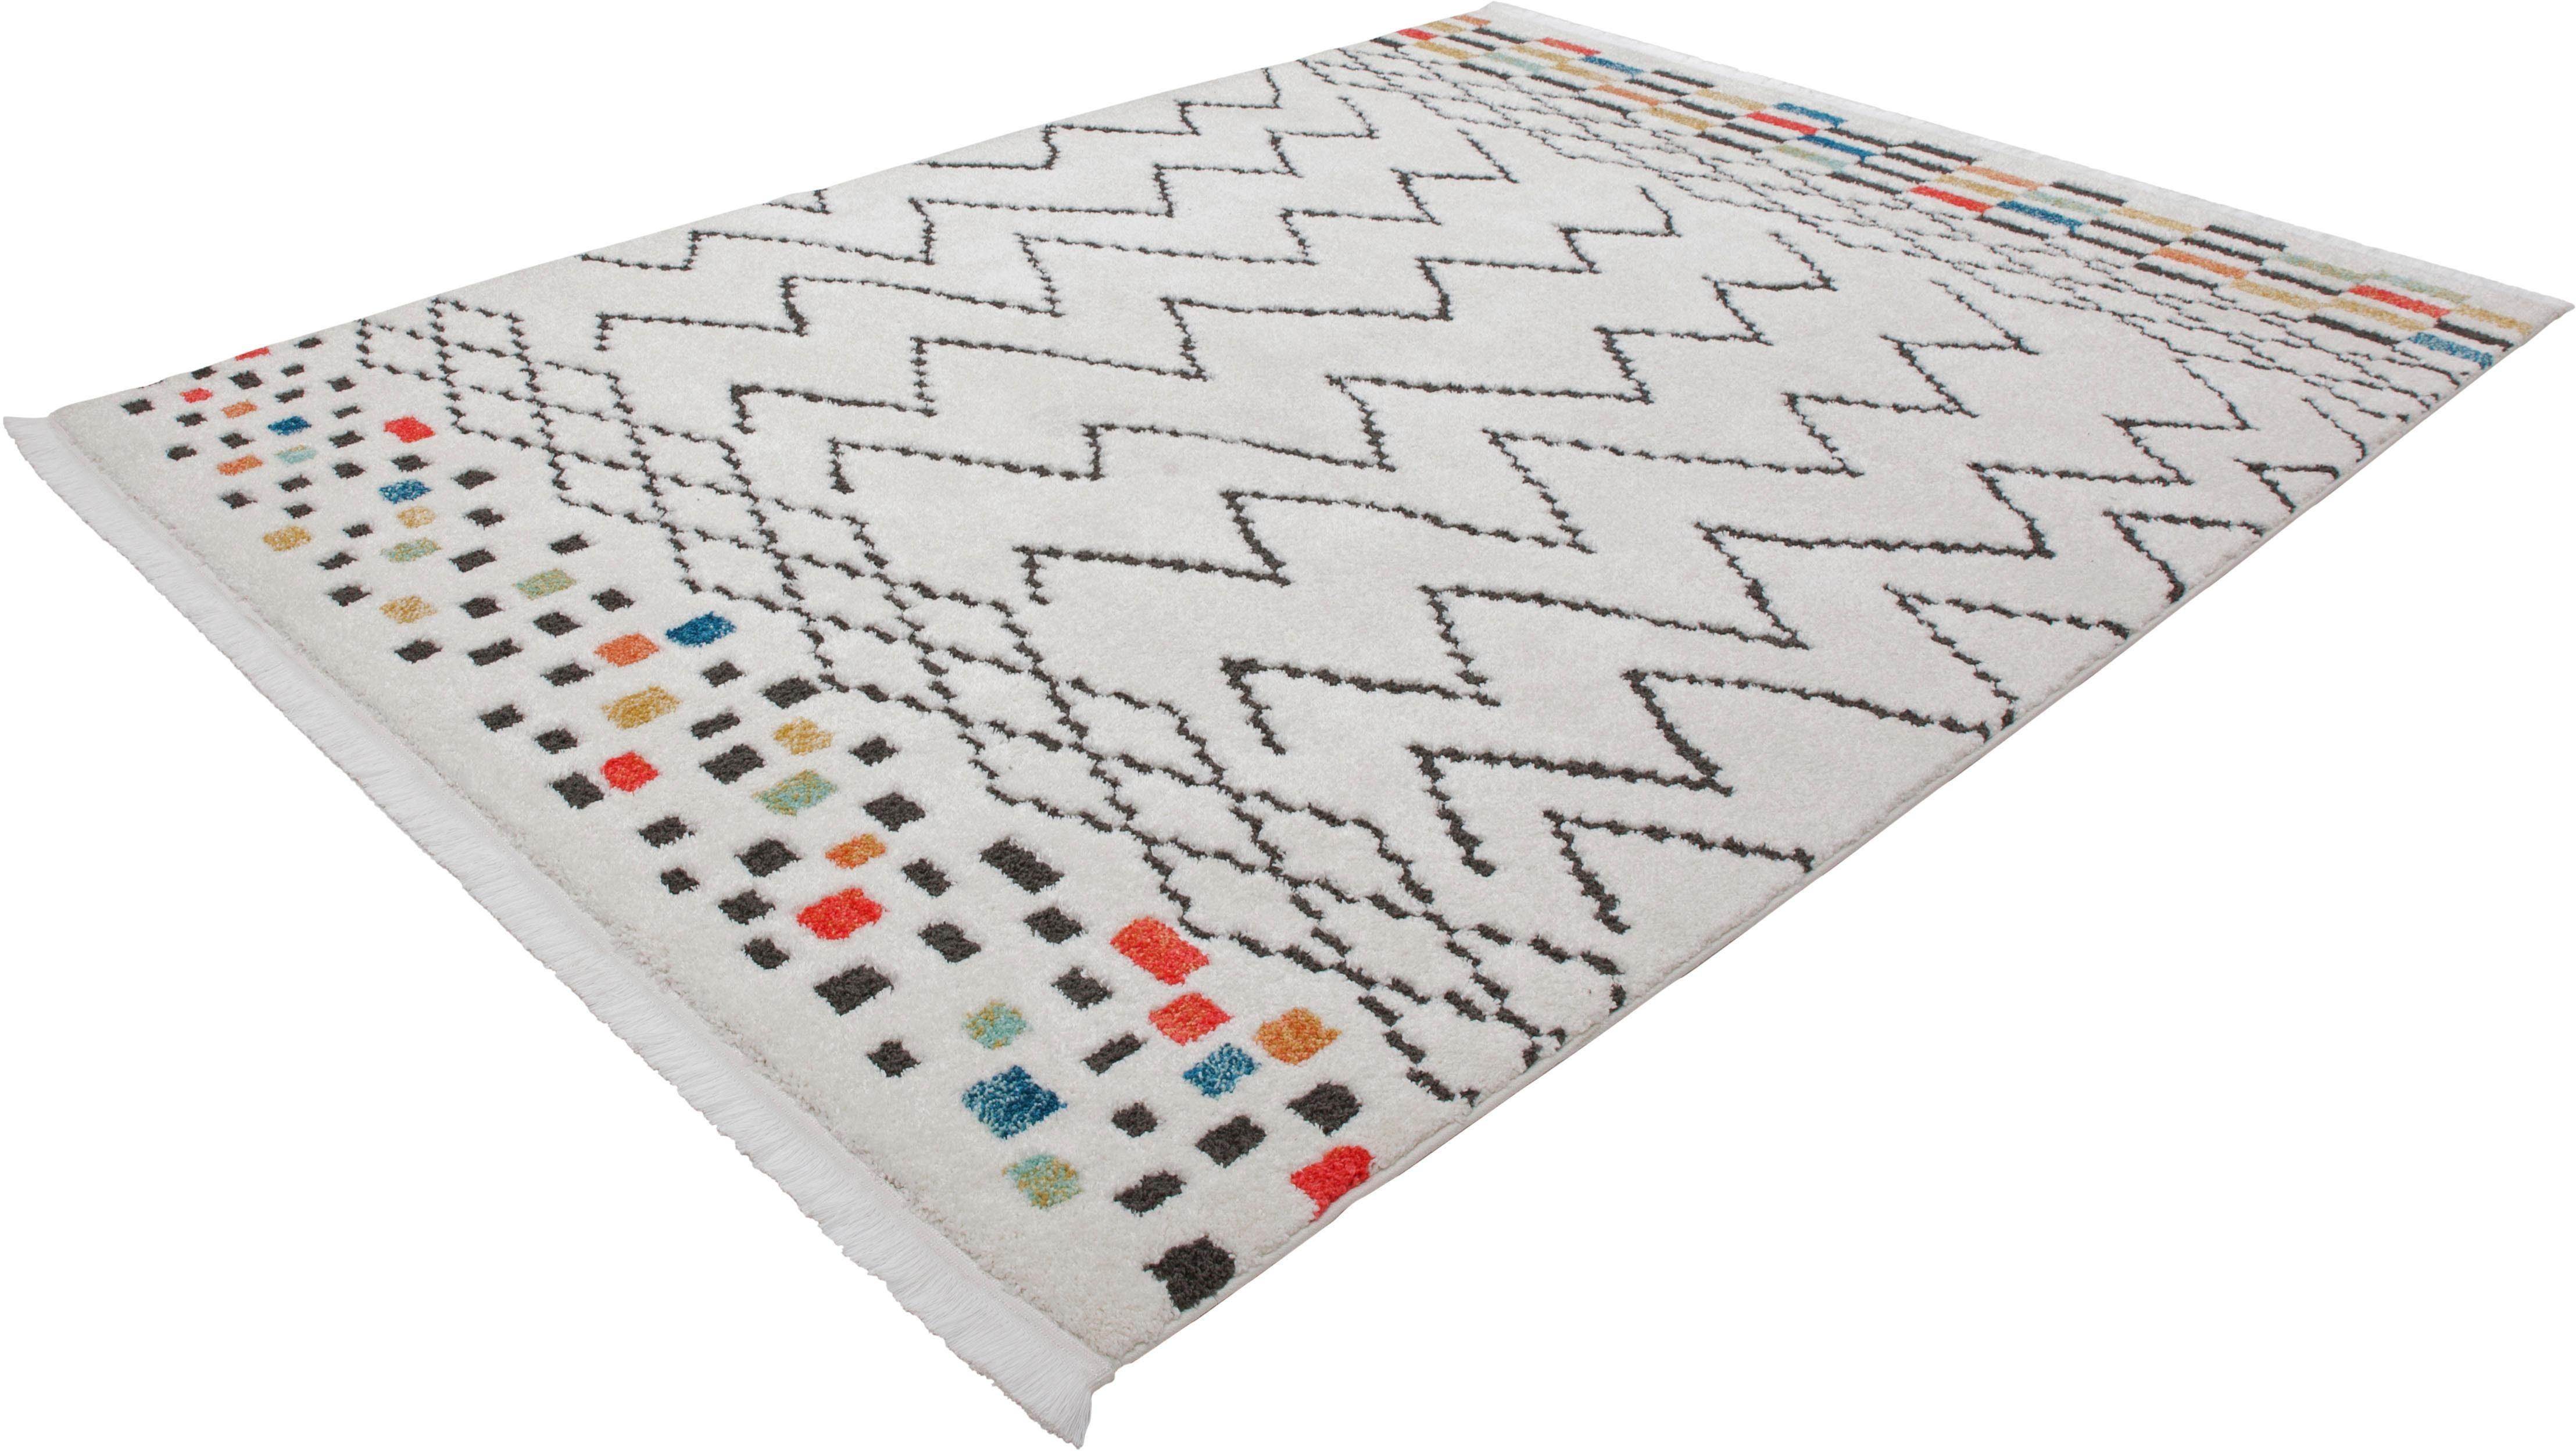 Teppich Yoel 415 calo-deluxe rechteckig Höhe 23 mm maschinell zusammengesetzt